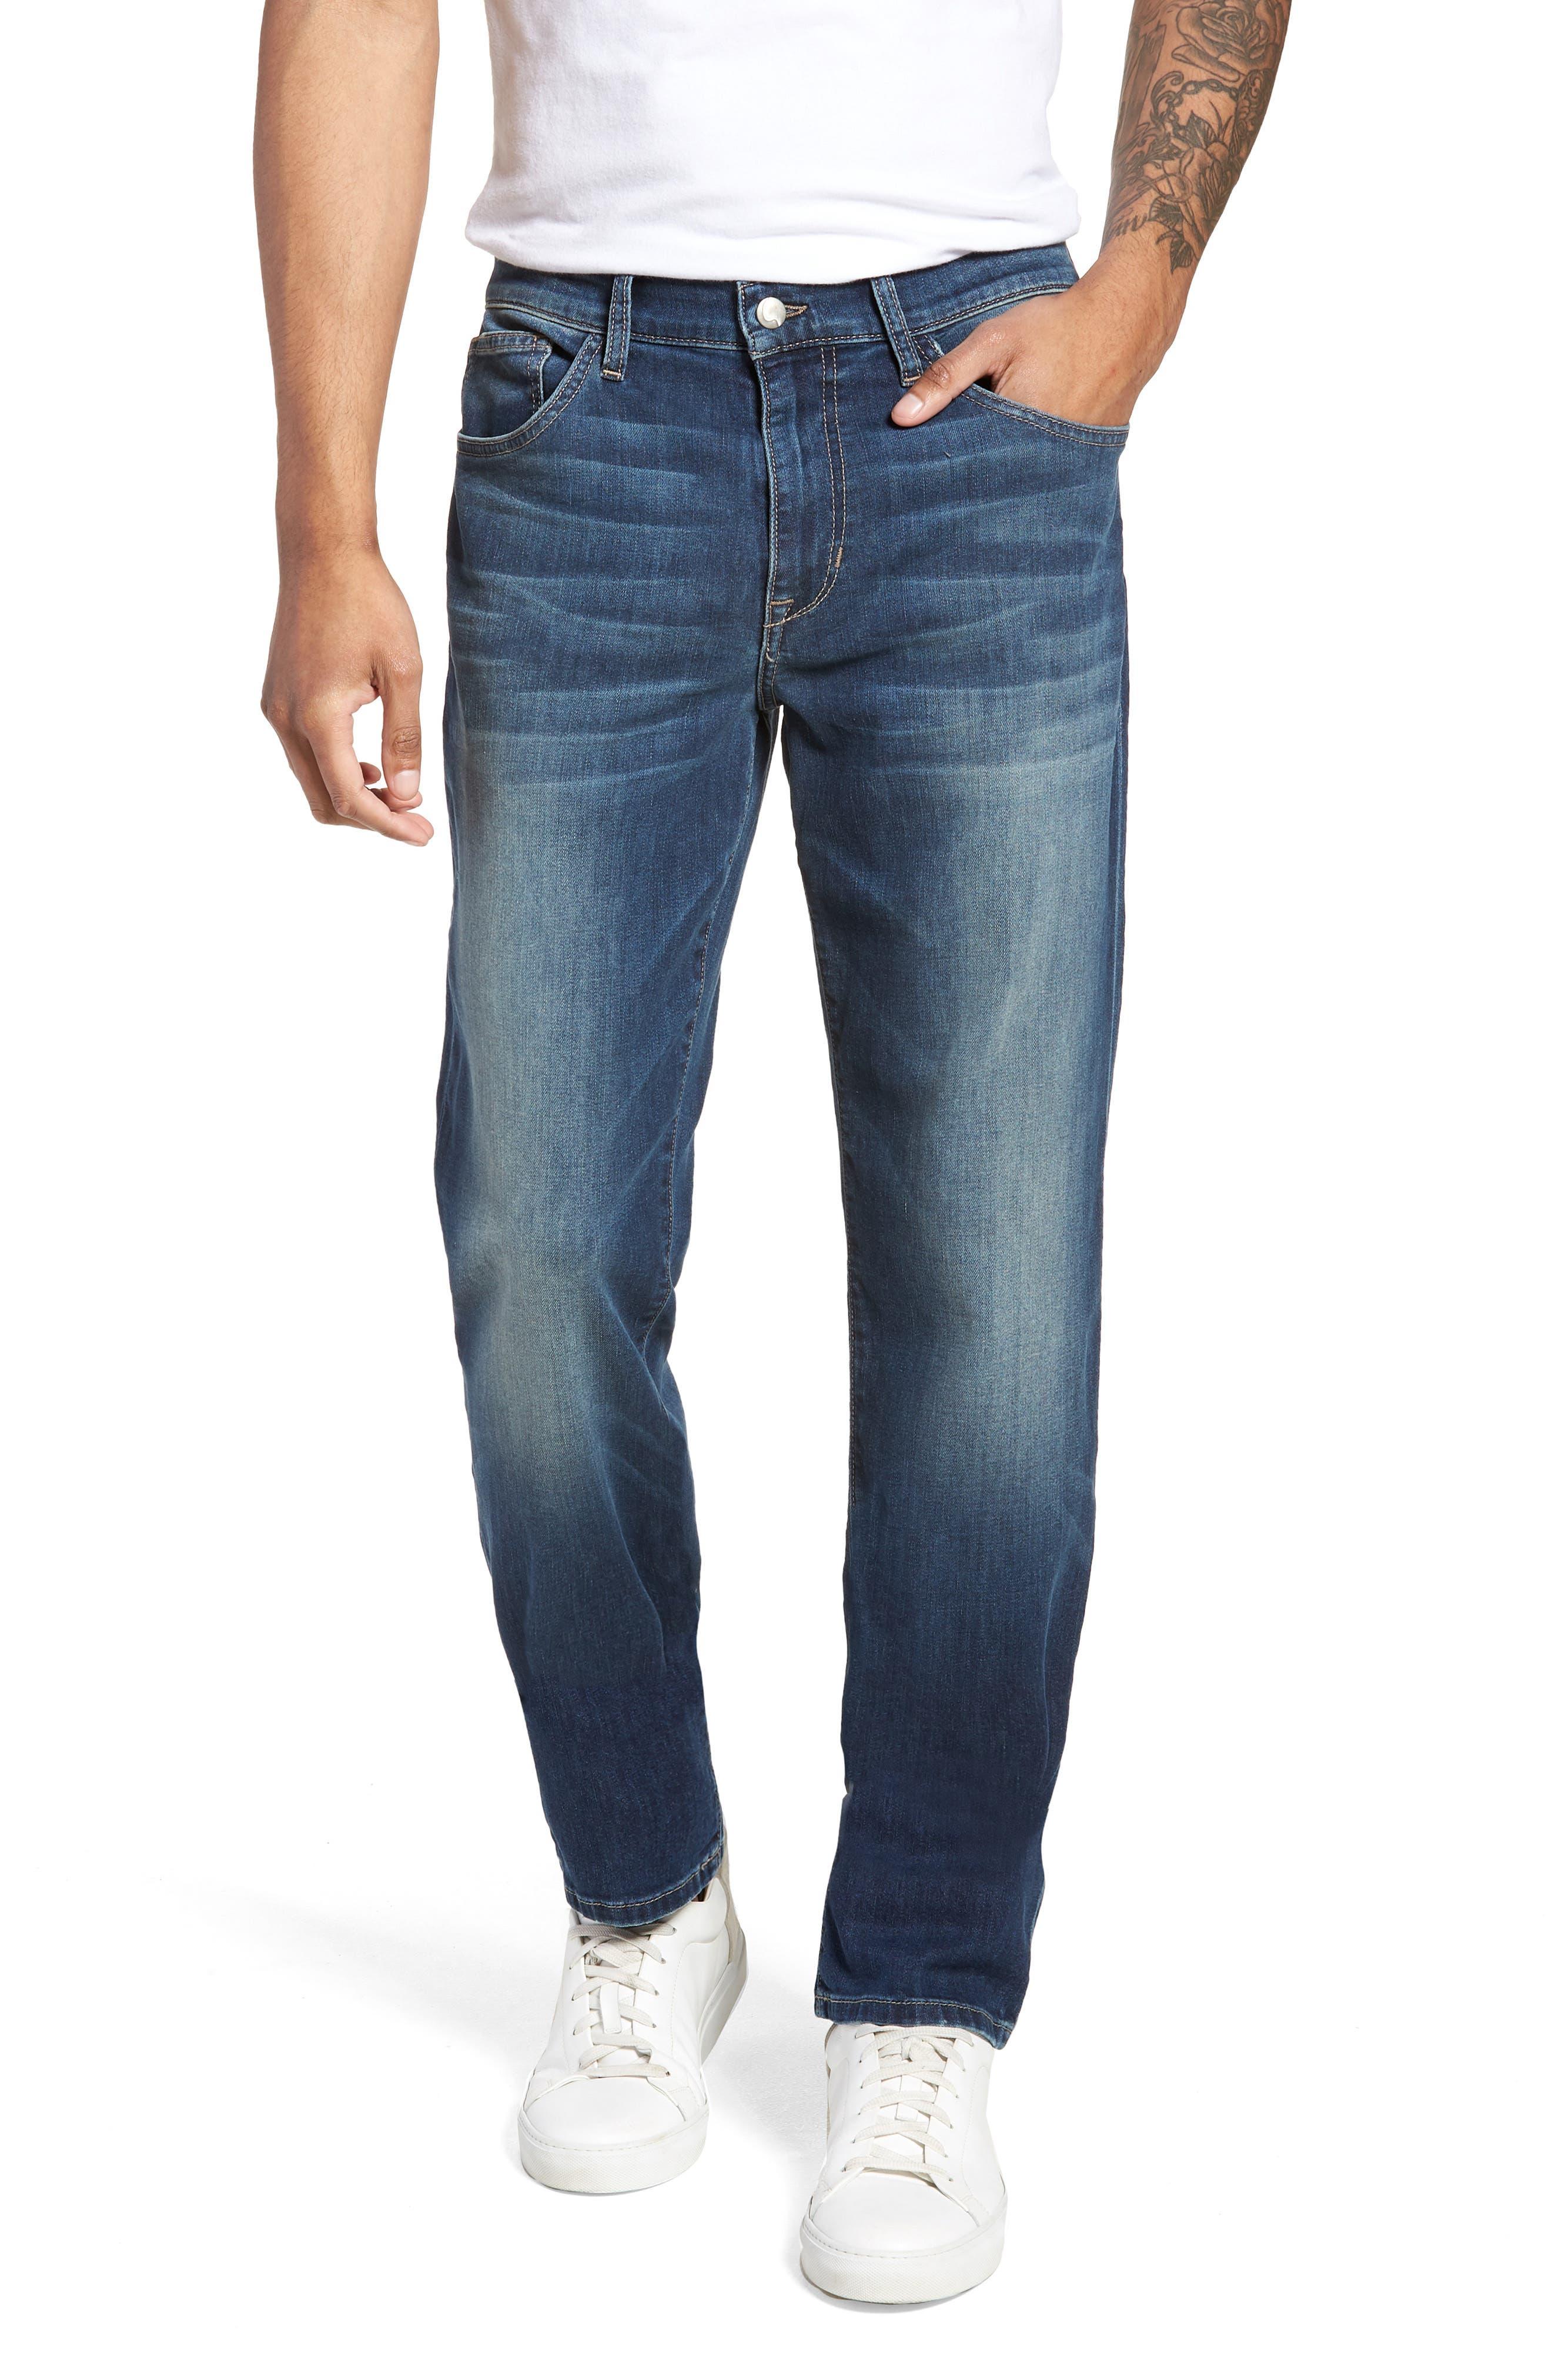 Brixton Slim Straight Fit Jeans,                         Main,                         color, Brady